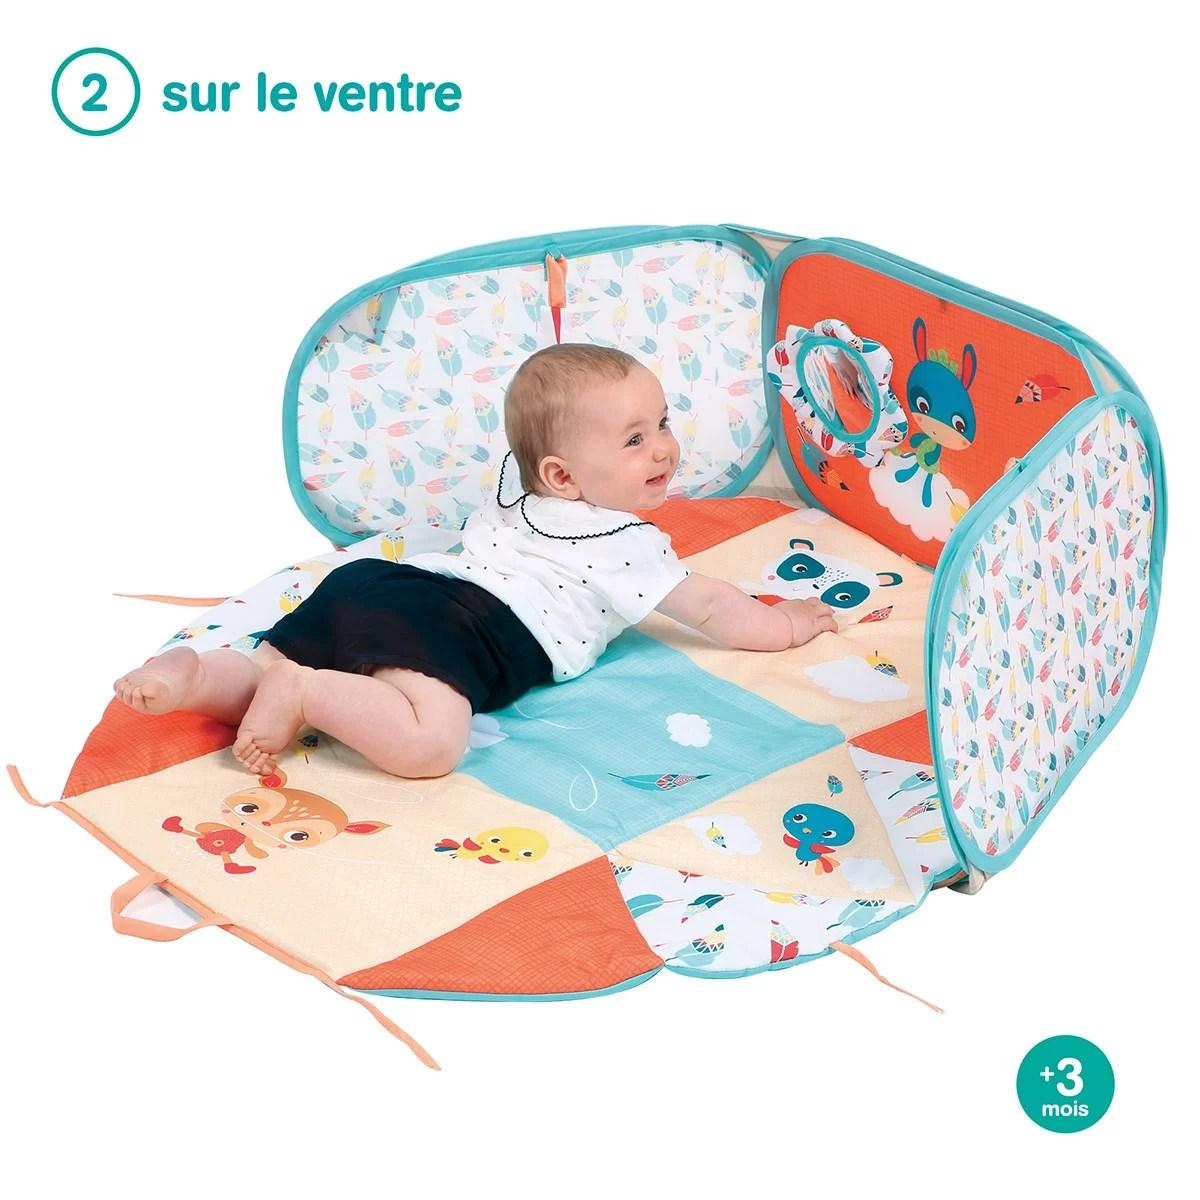 https www lagranderecre fr jouets d eveil et peluches jouets d eveil tapis d eveil multifonction html